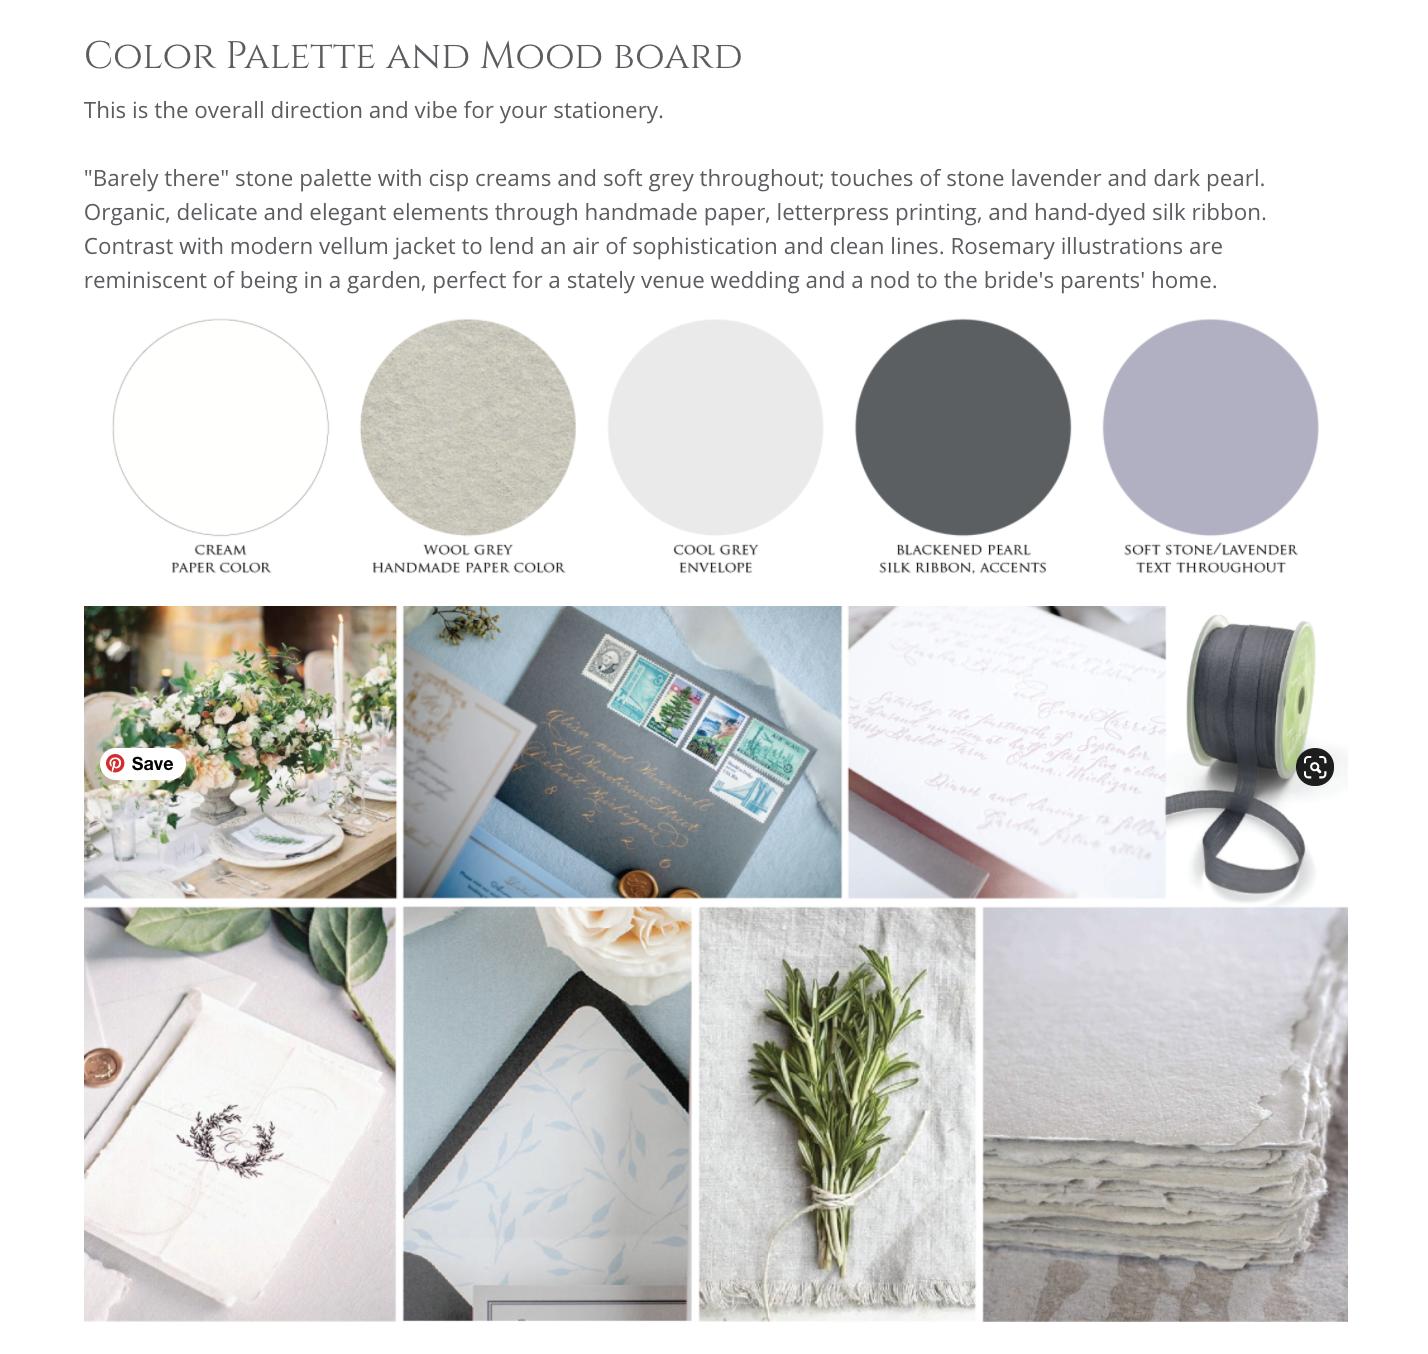 Custom lookbook and mood board for wedding invitations - Custom stationery process - Leah E. Moss Designs